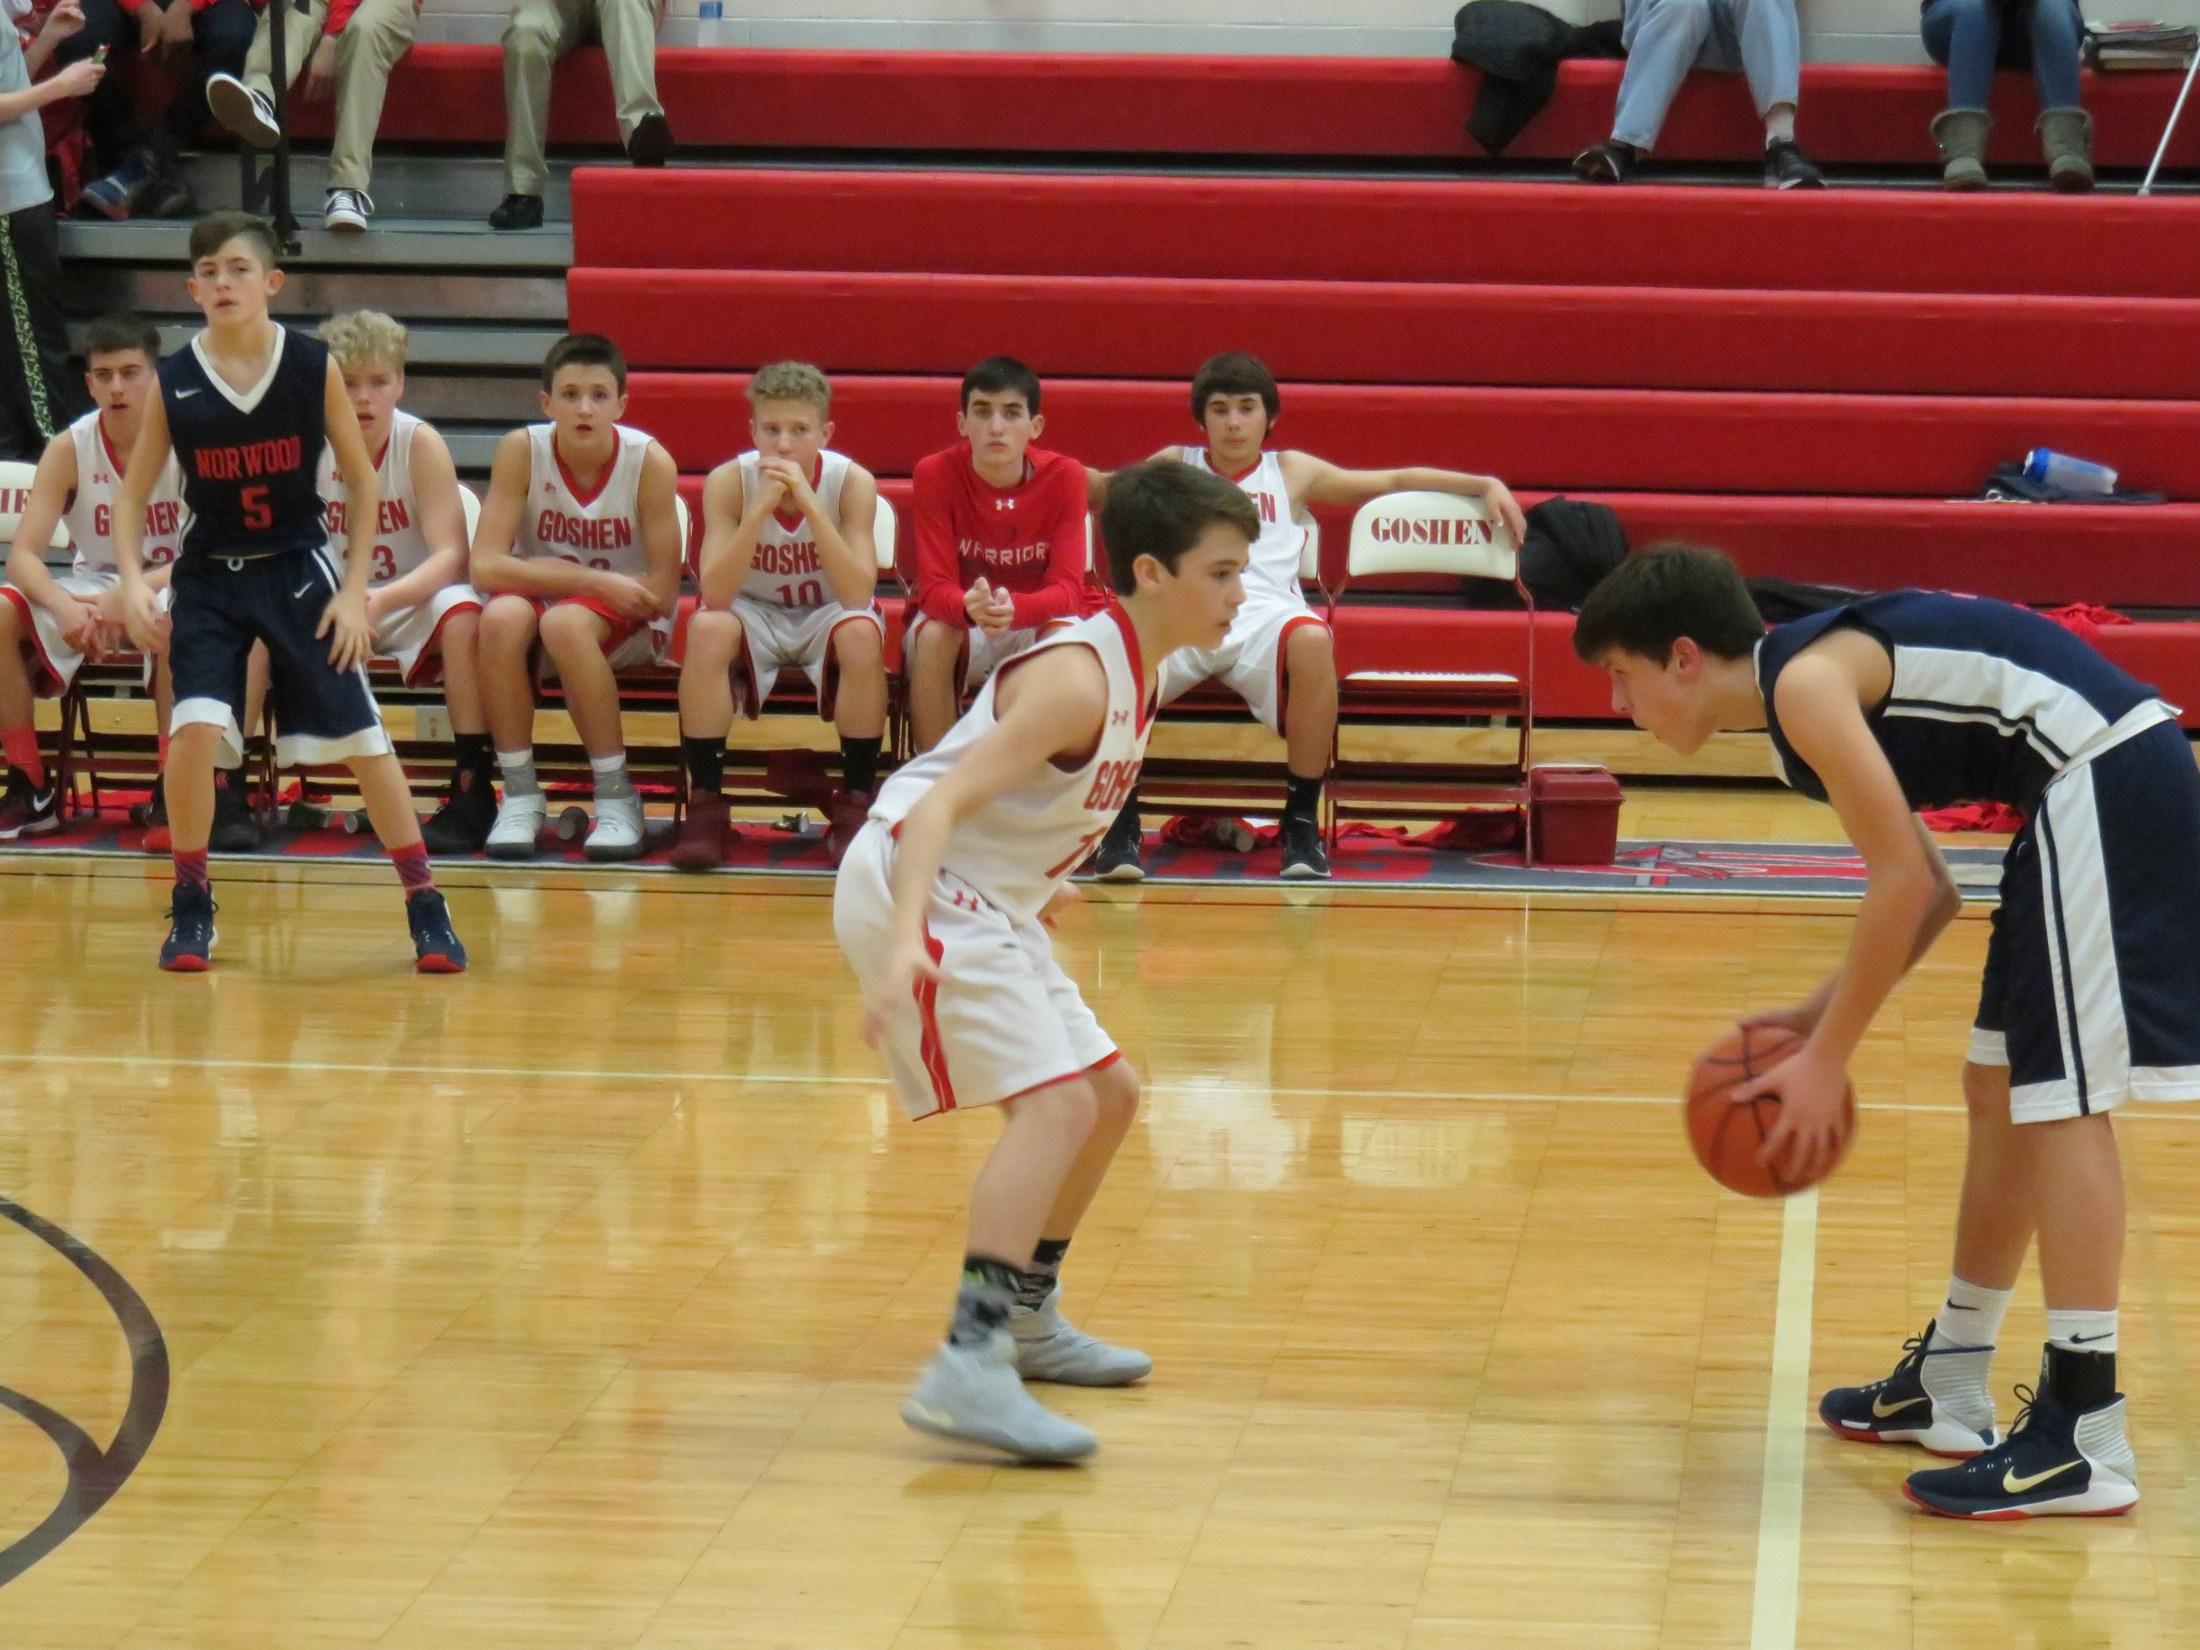 8th grade boys basketball players Joe Alvarado